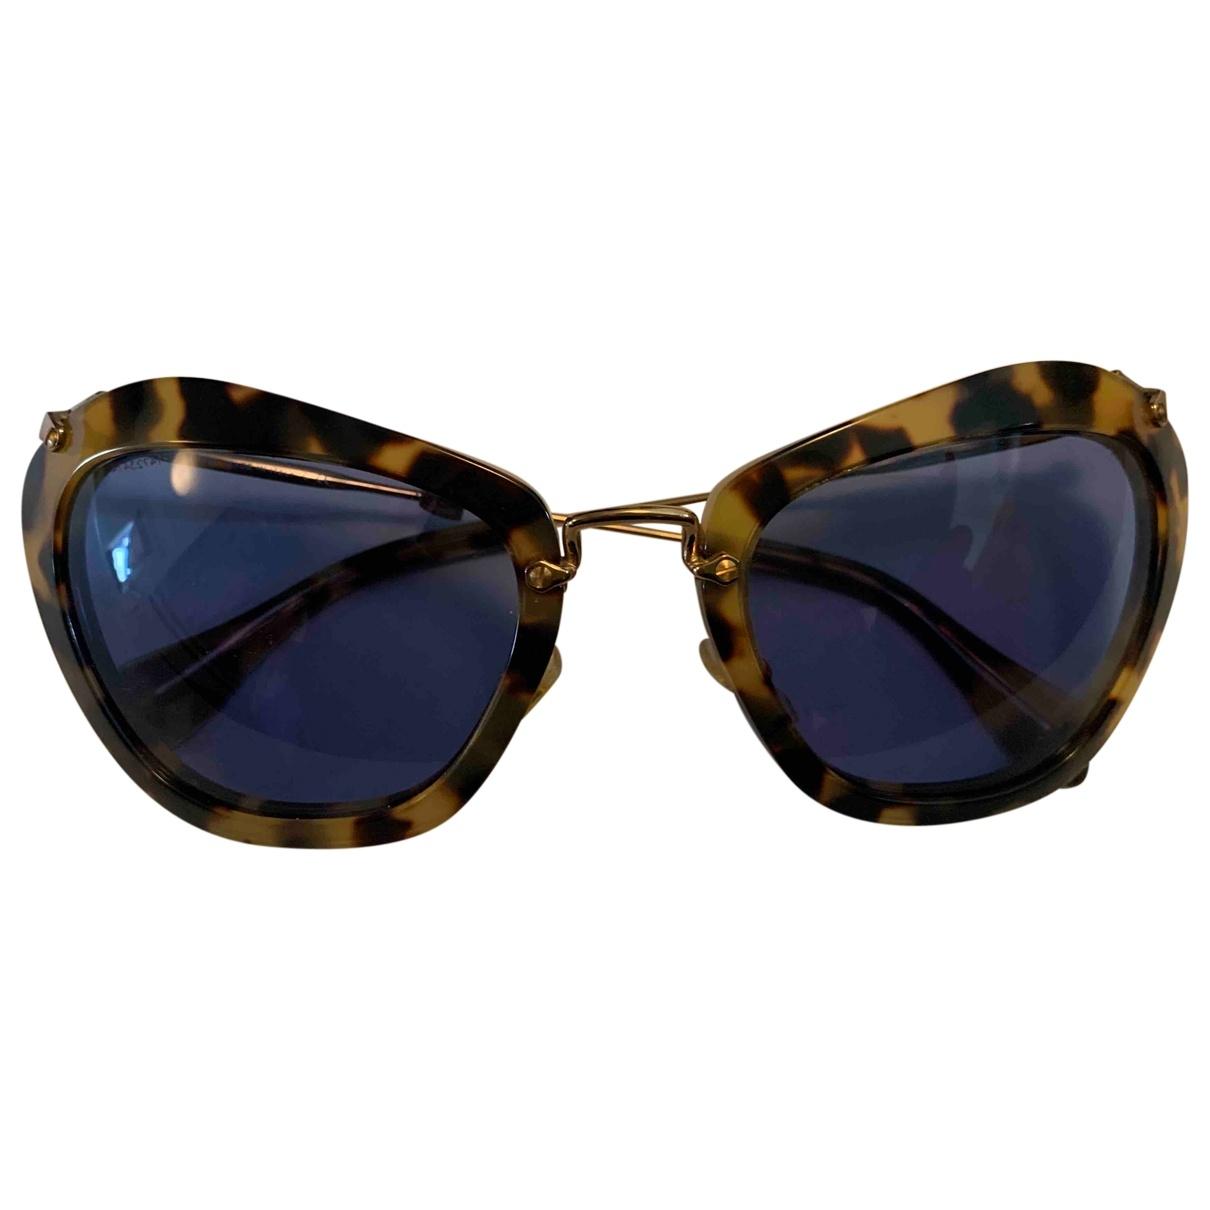 Miu Miu \N Sonnenbrillen in  Bunt Metall